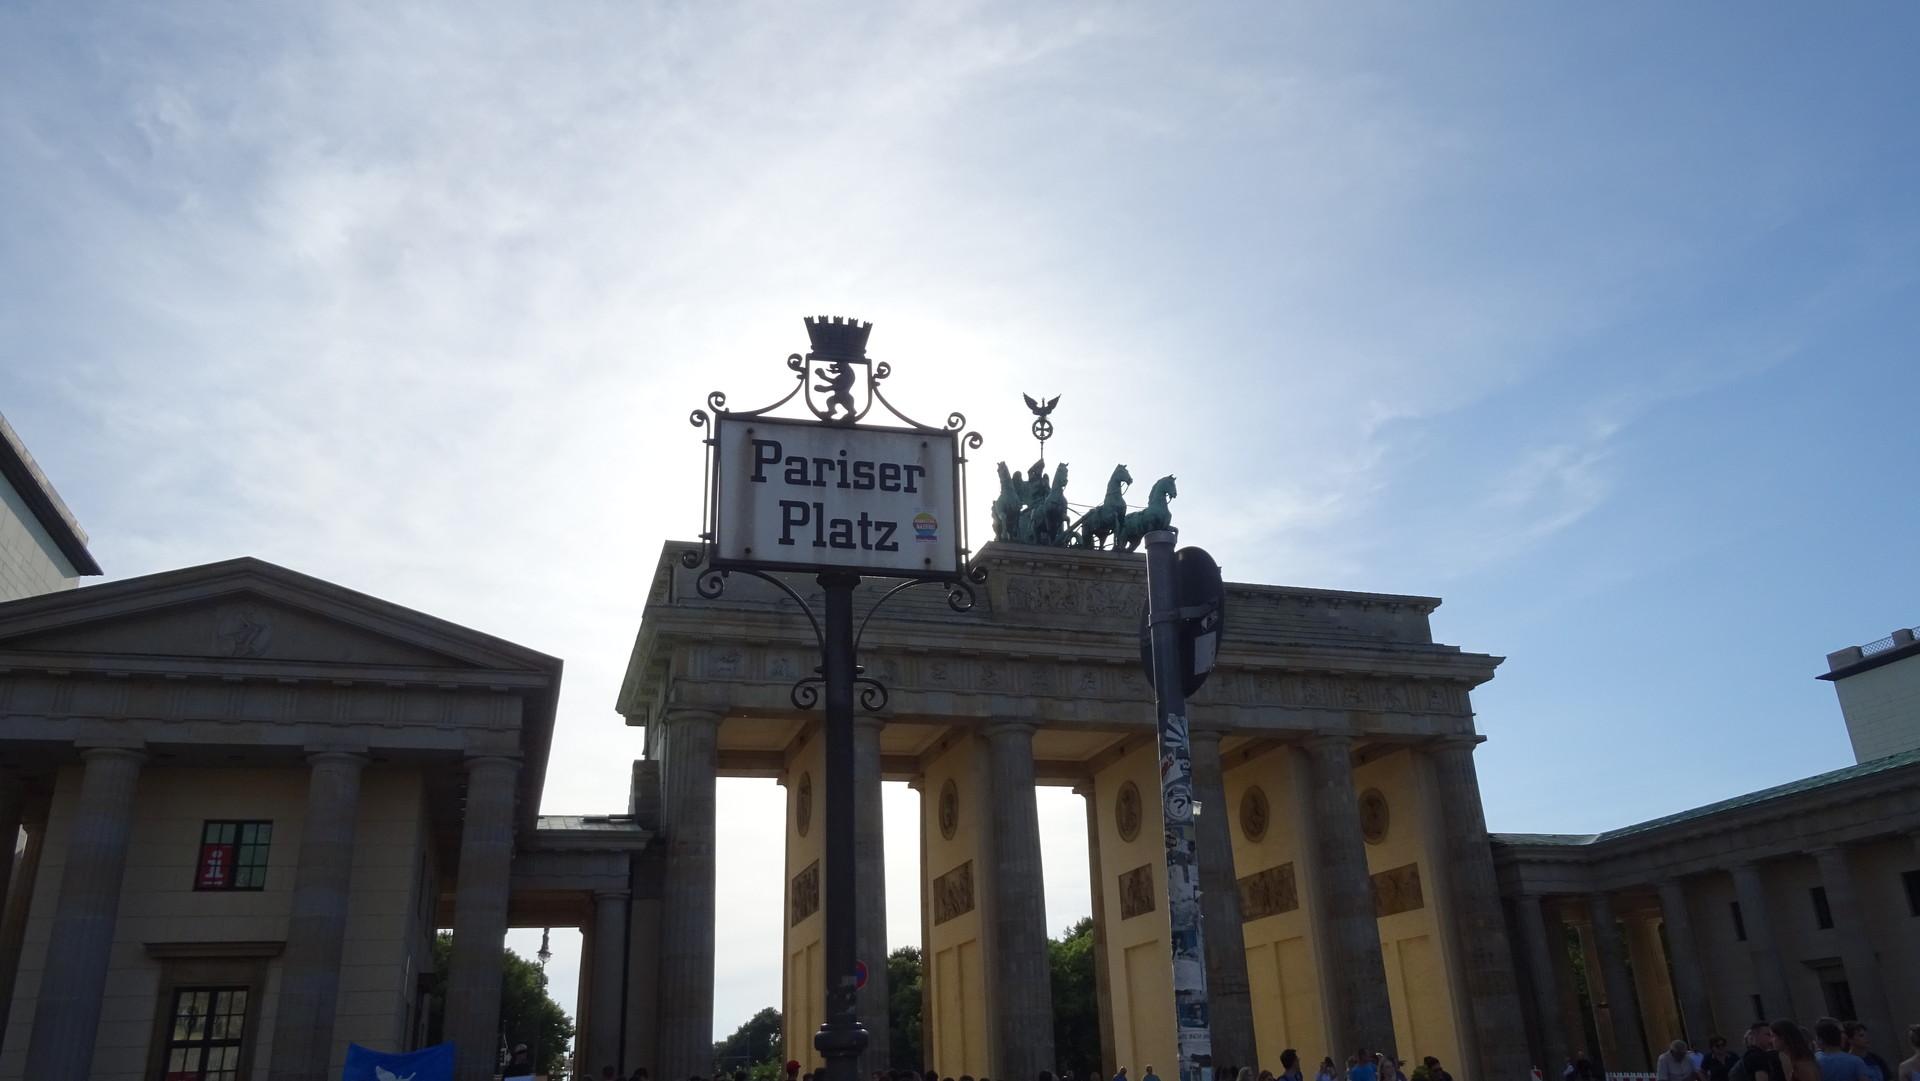 puerta-brandemburgo-f0f96fdbe33215281685